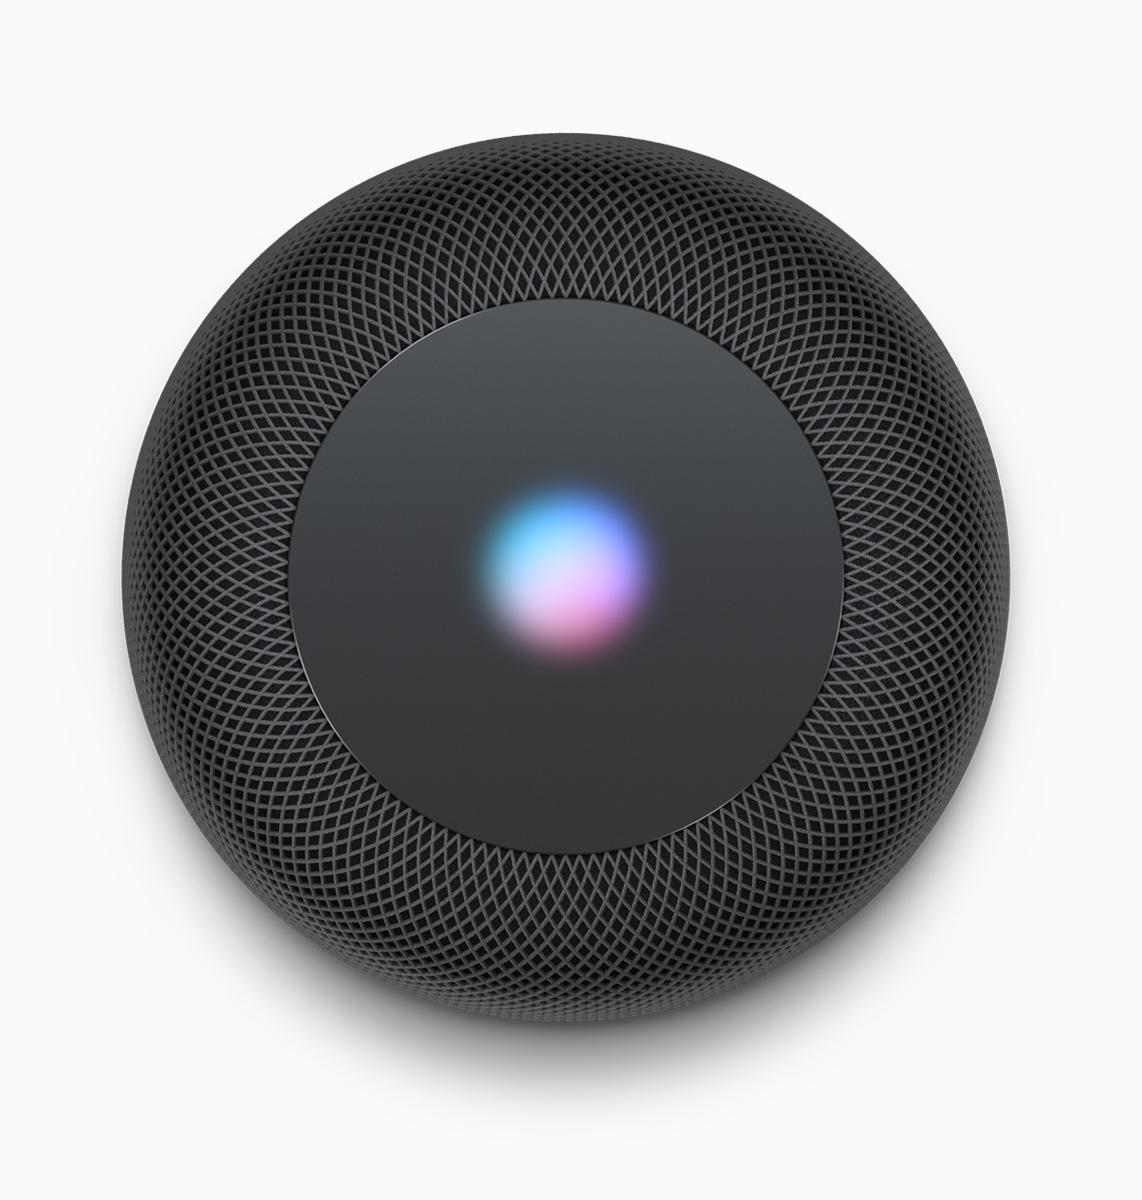 HomePod, 집에서 즐기는 음악을 완전히 바꾸다